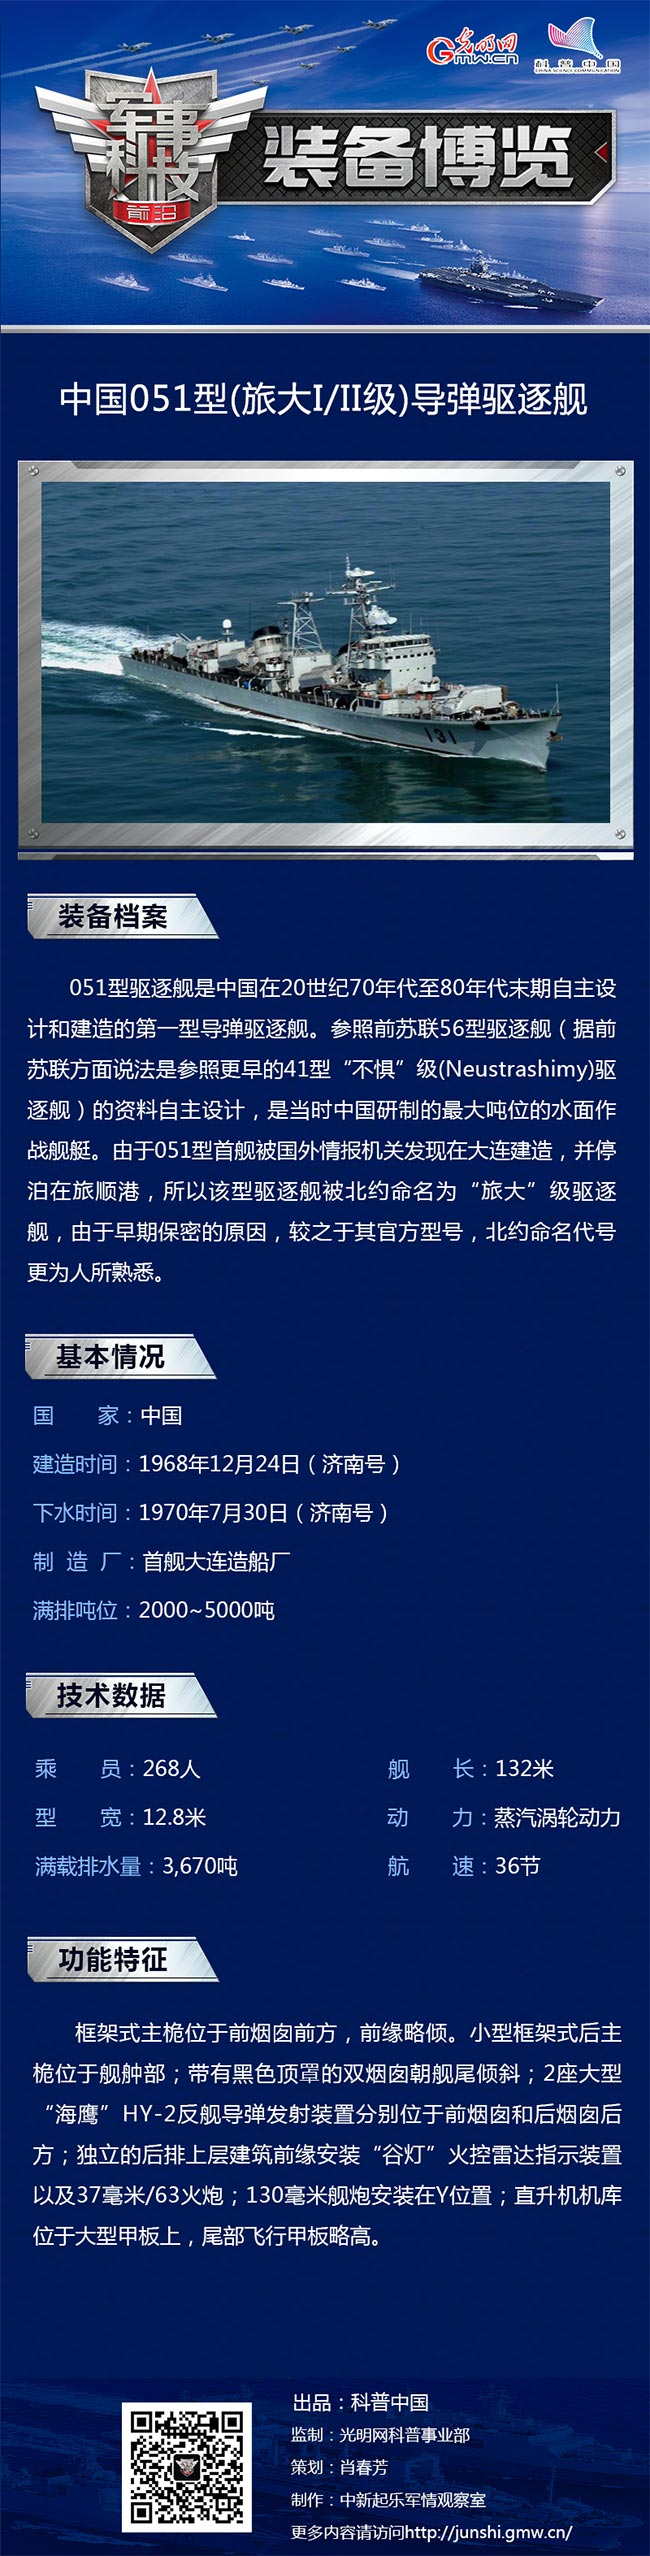 bob体育app官方网站 2